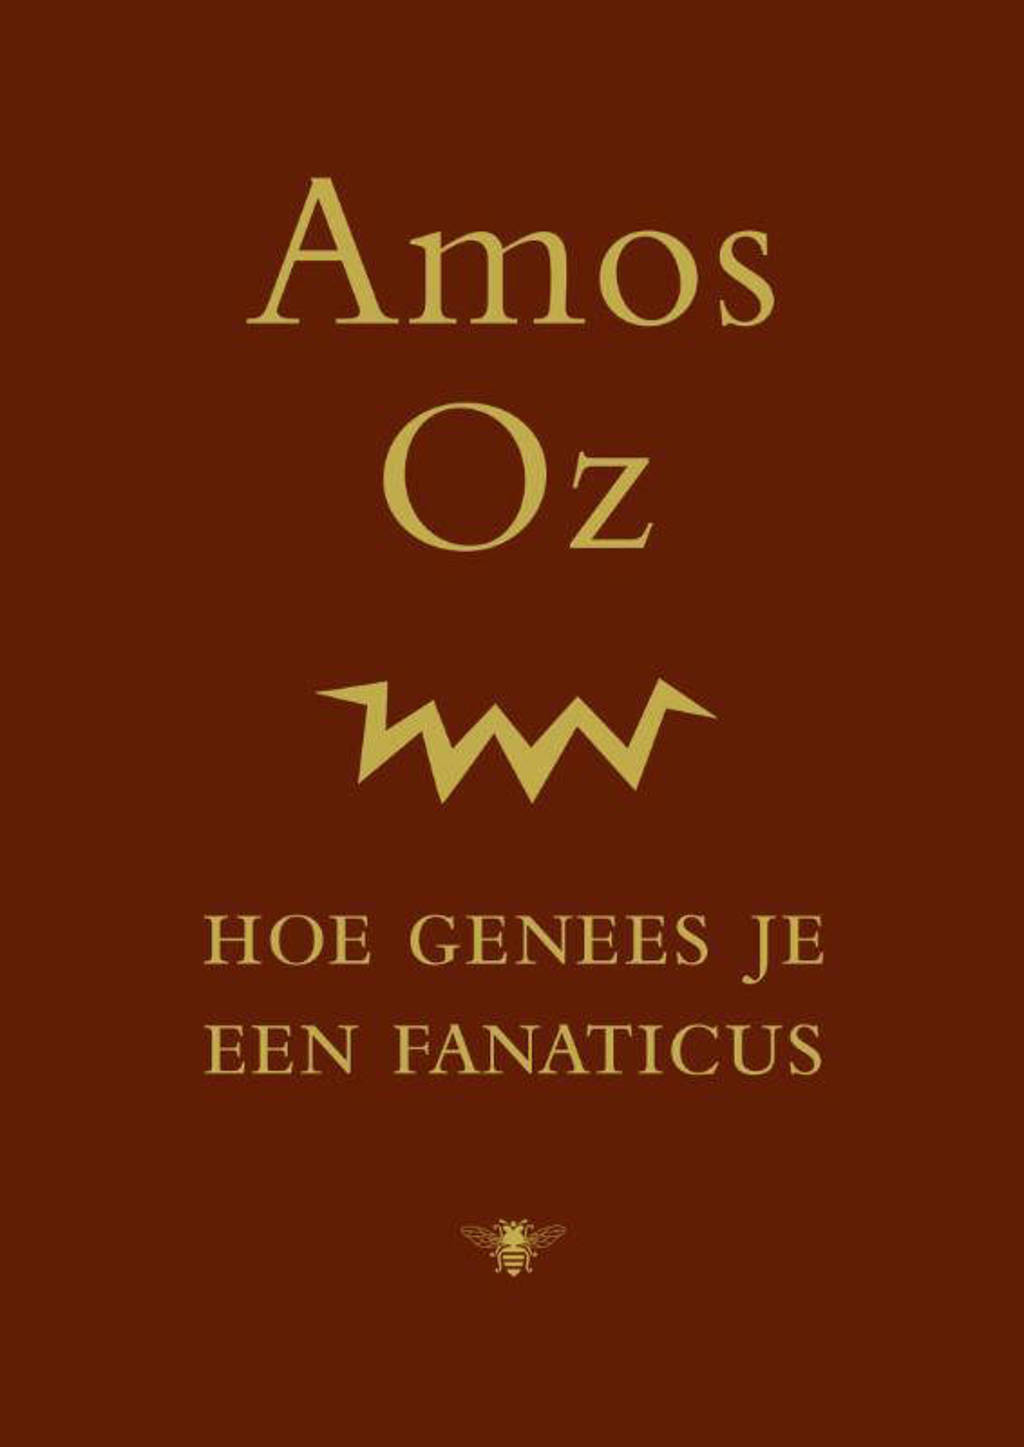 Hoe genees je een fanaticus - Amos Oz